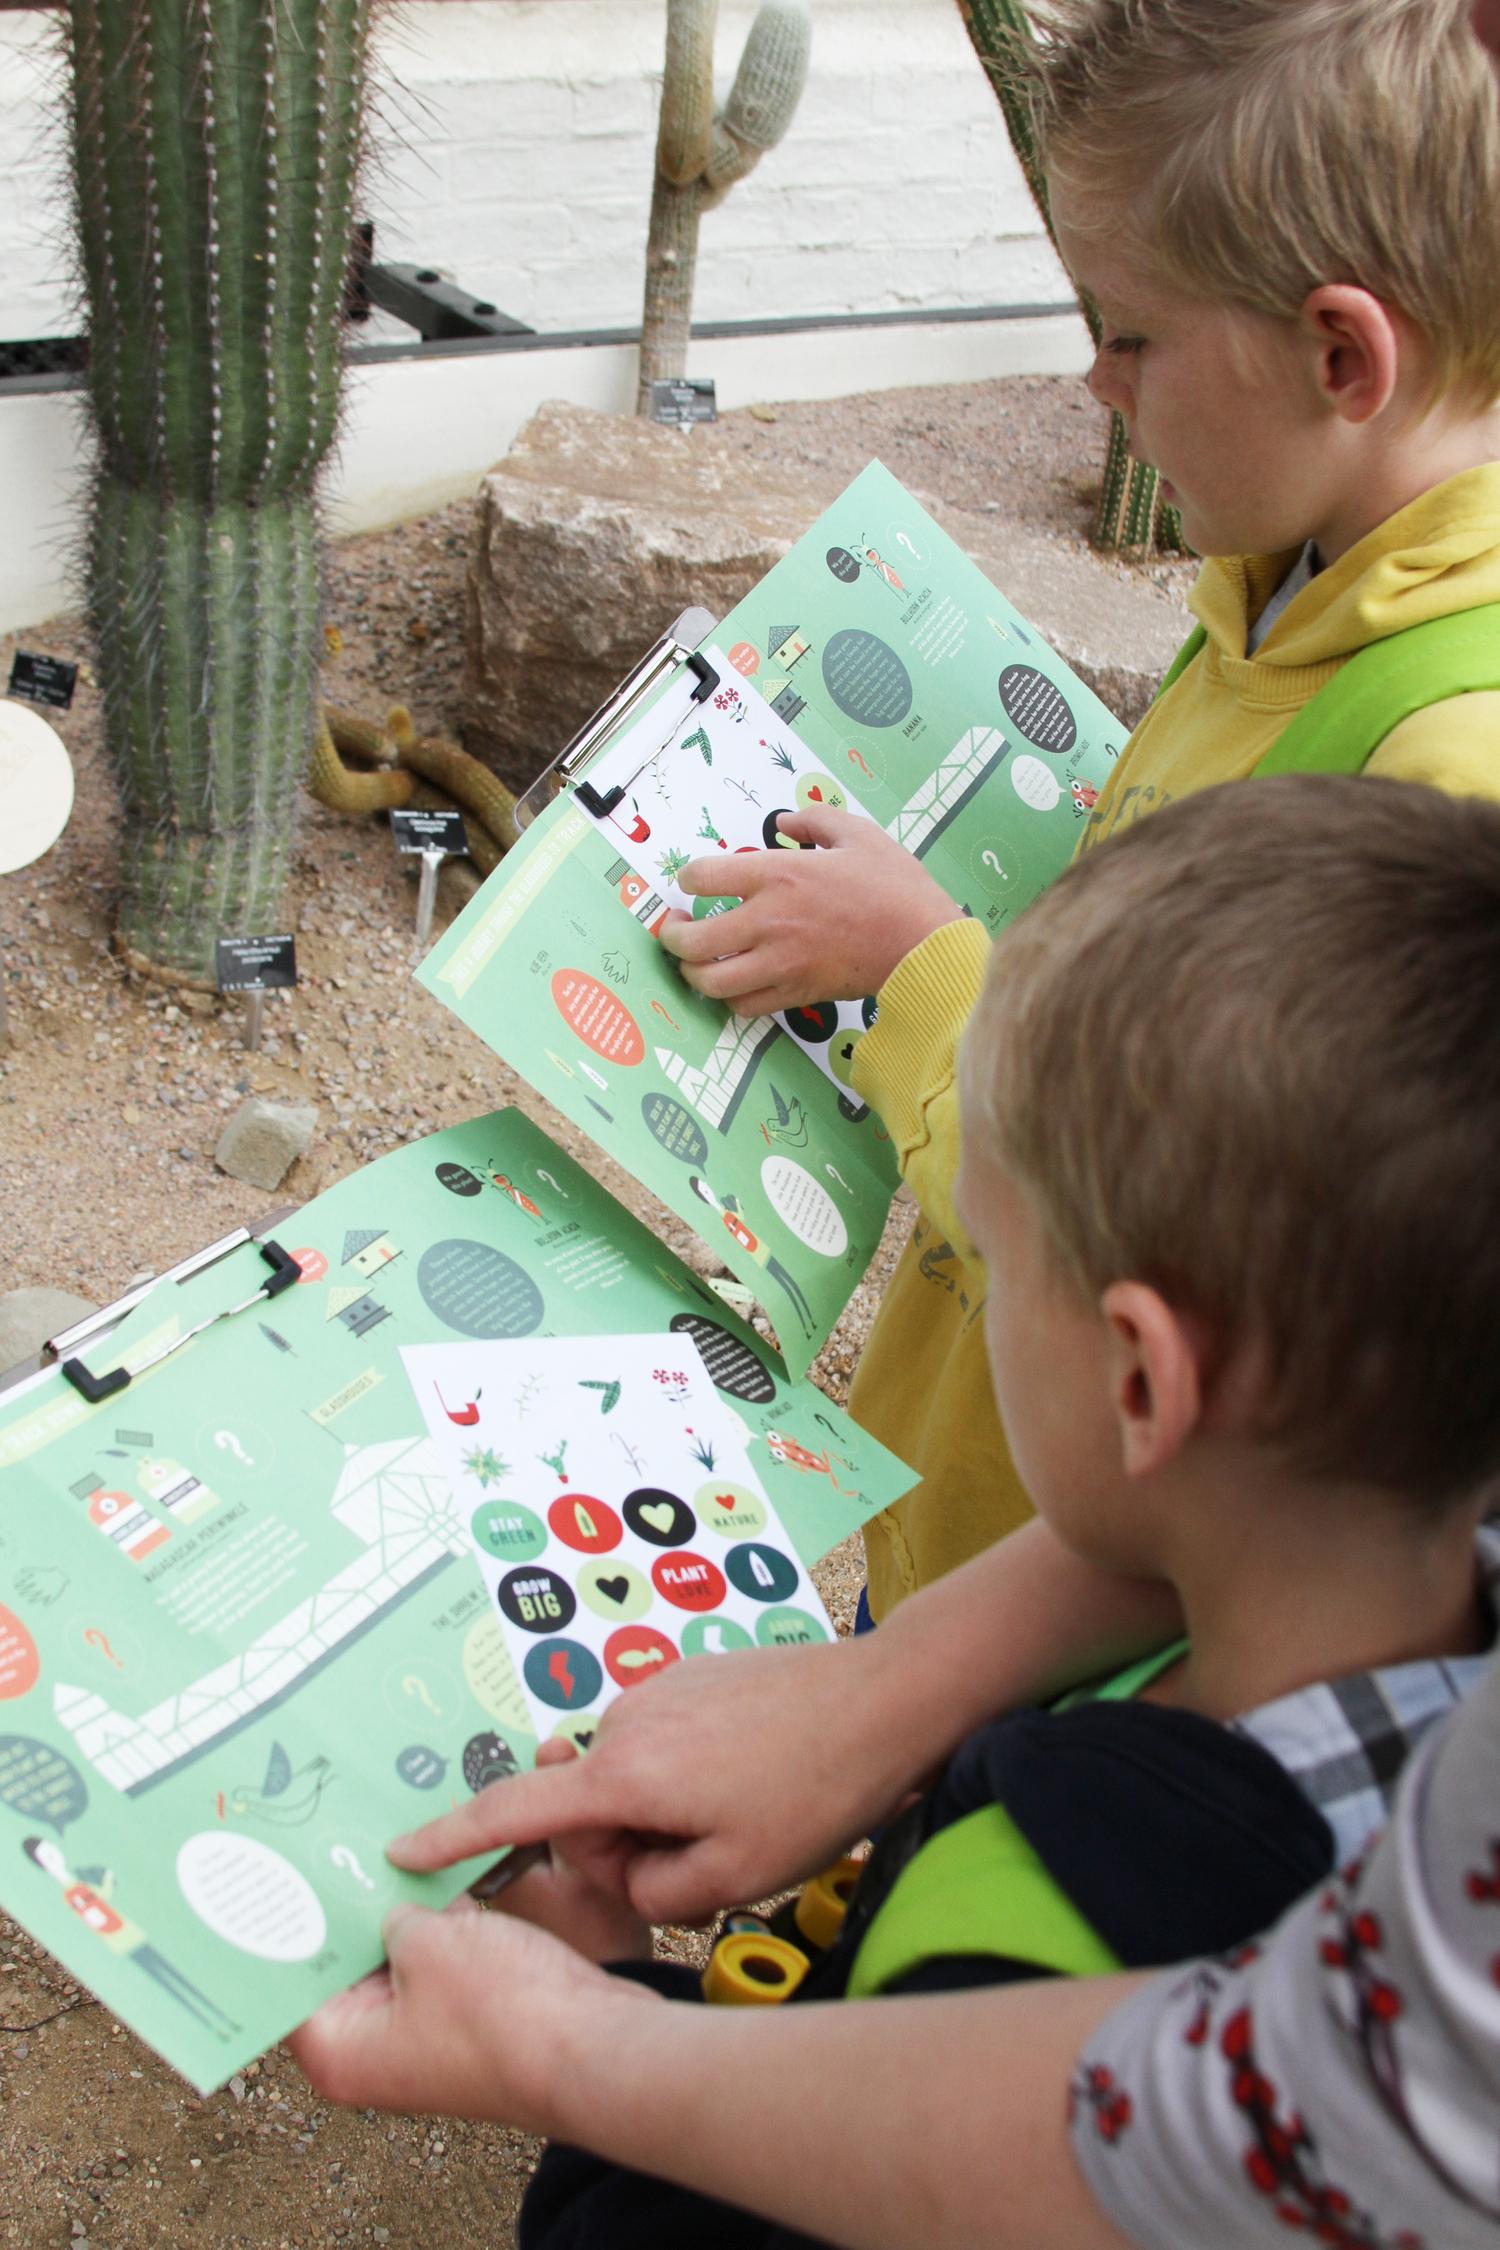 hannahalice-illustration-theweirdandwonderfulworldofplants-cambridgeuniversitybotanicgarden-summer-trails-plants-facts-guides-children-activities.jpg